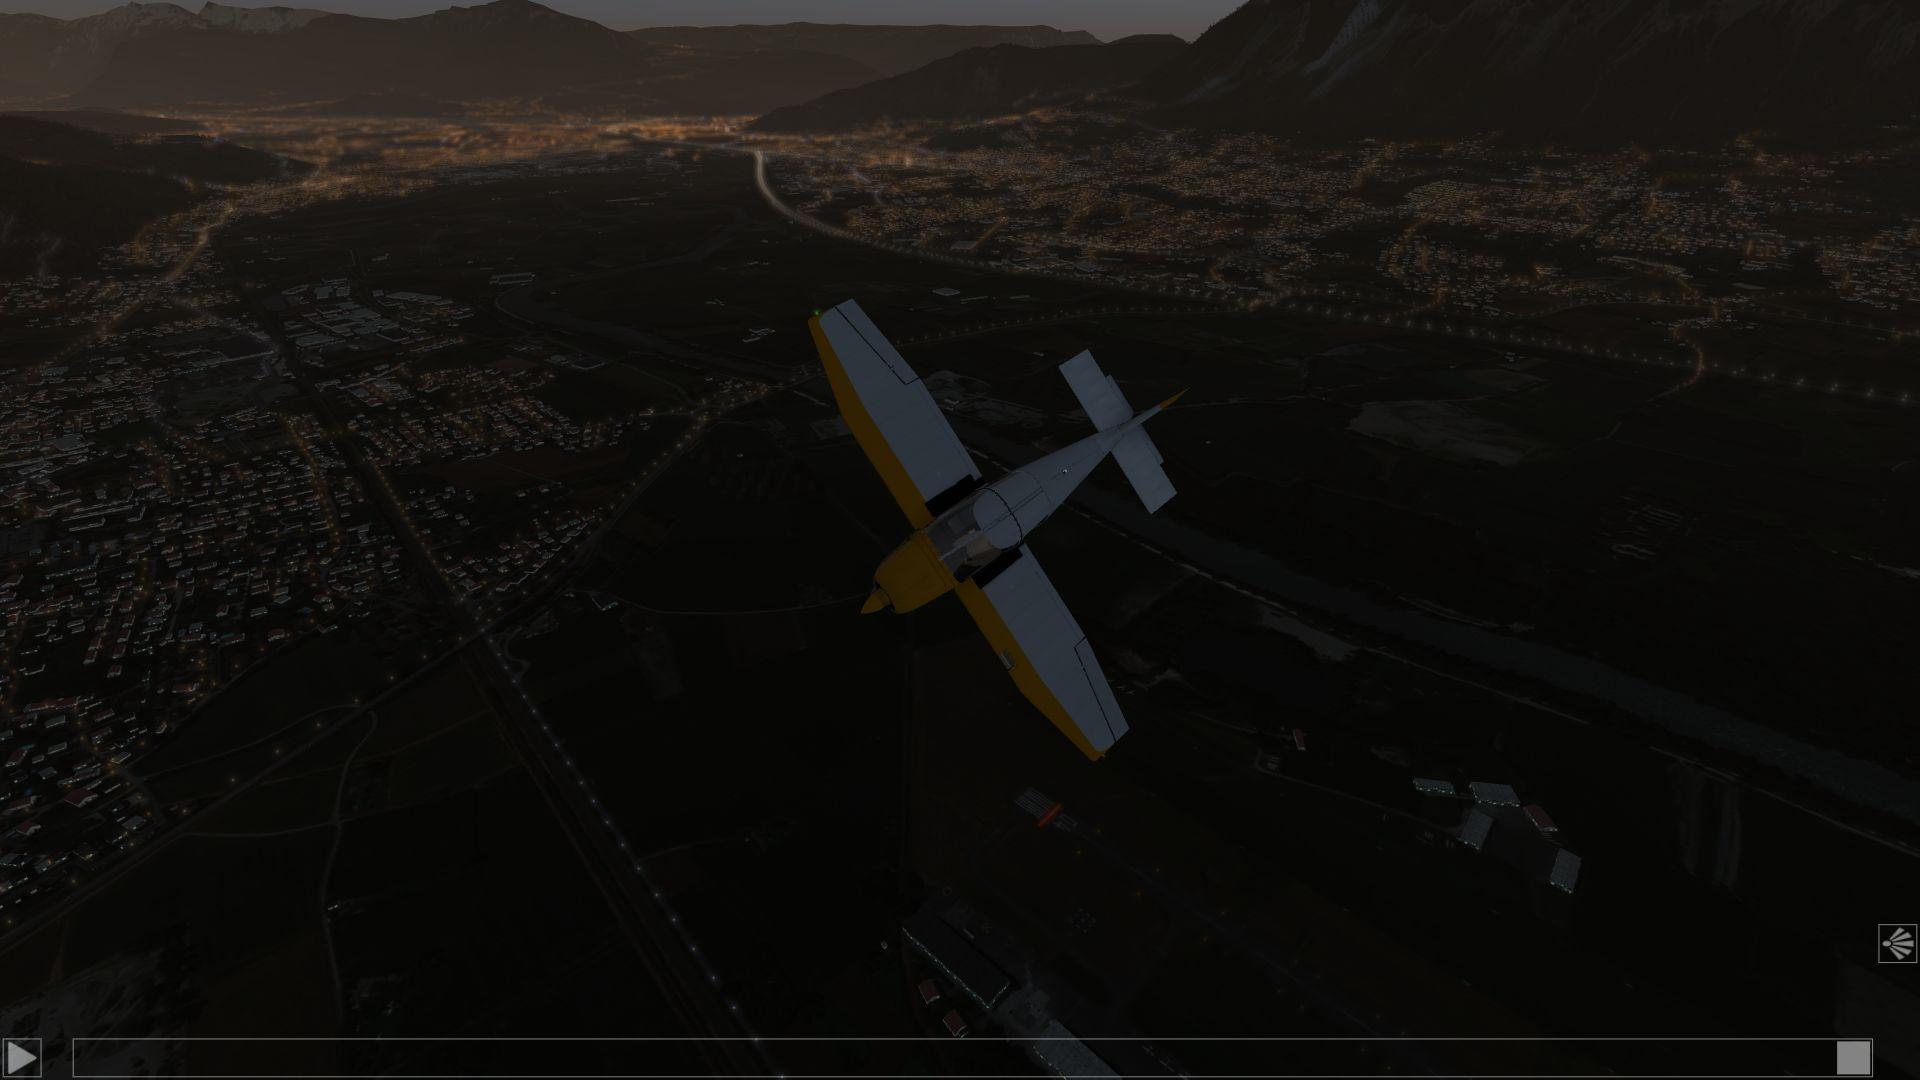 http://www.pilote-virtuel.com/img/gallery/1517250658.jpg